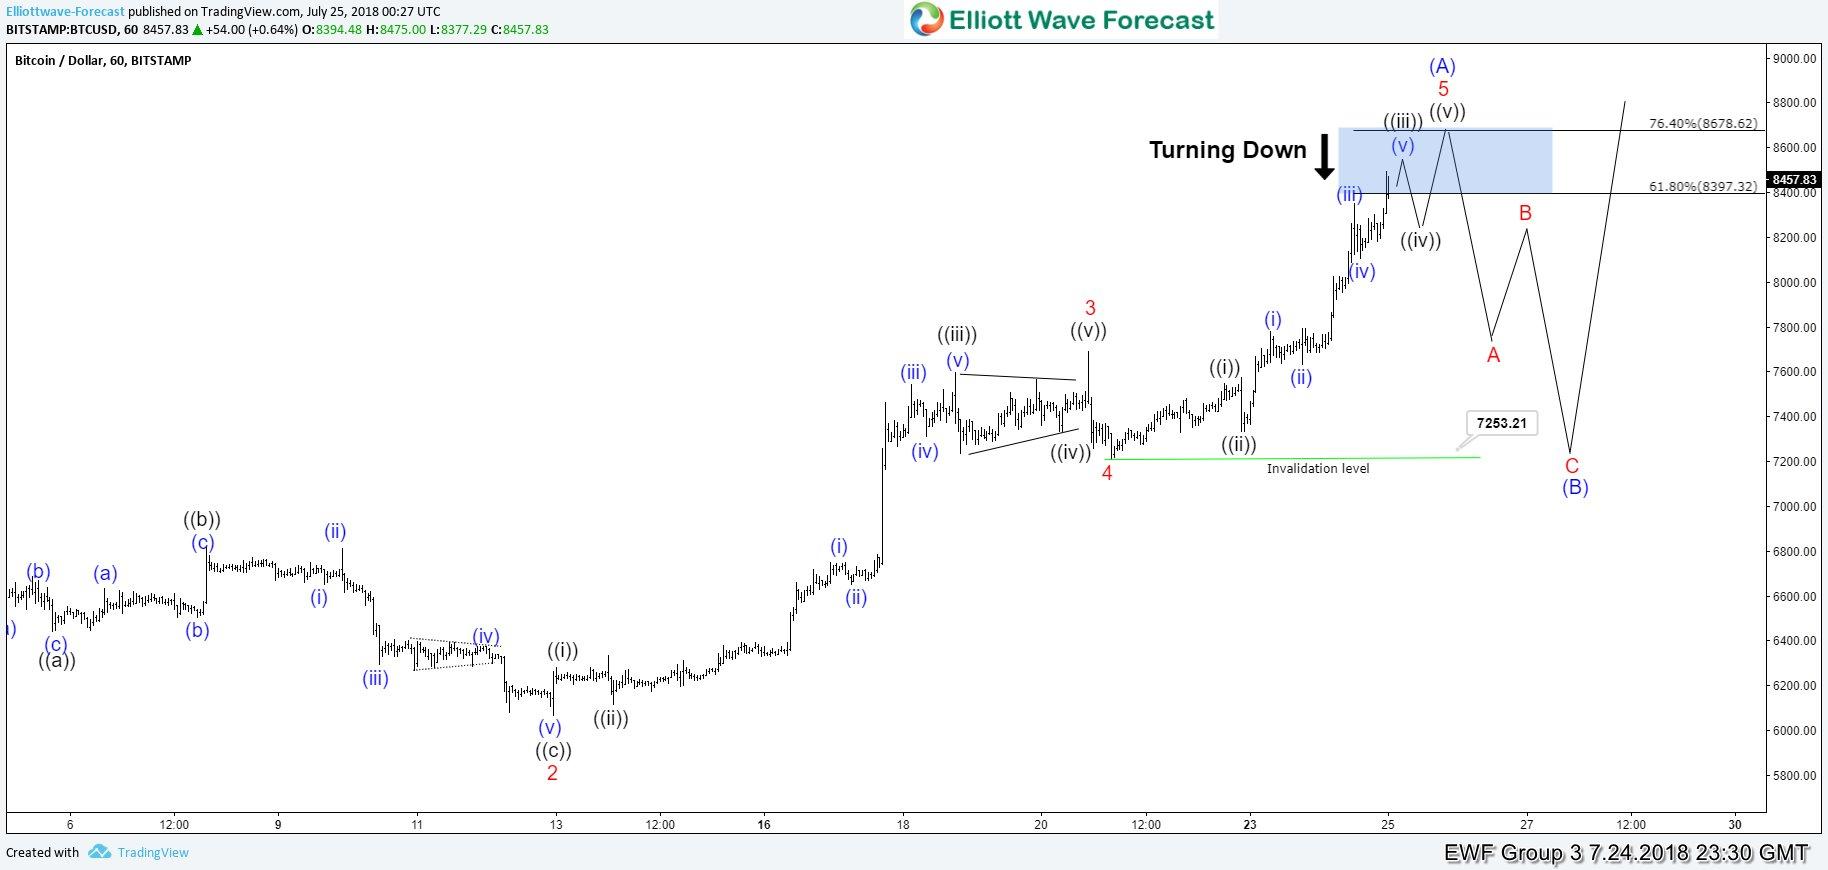 Bitcoin Elliott Wave Analysis: Close to Ending 5 Waves